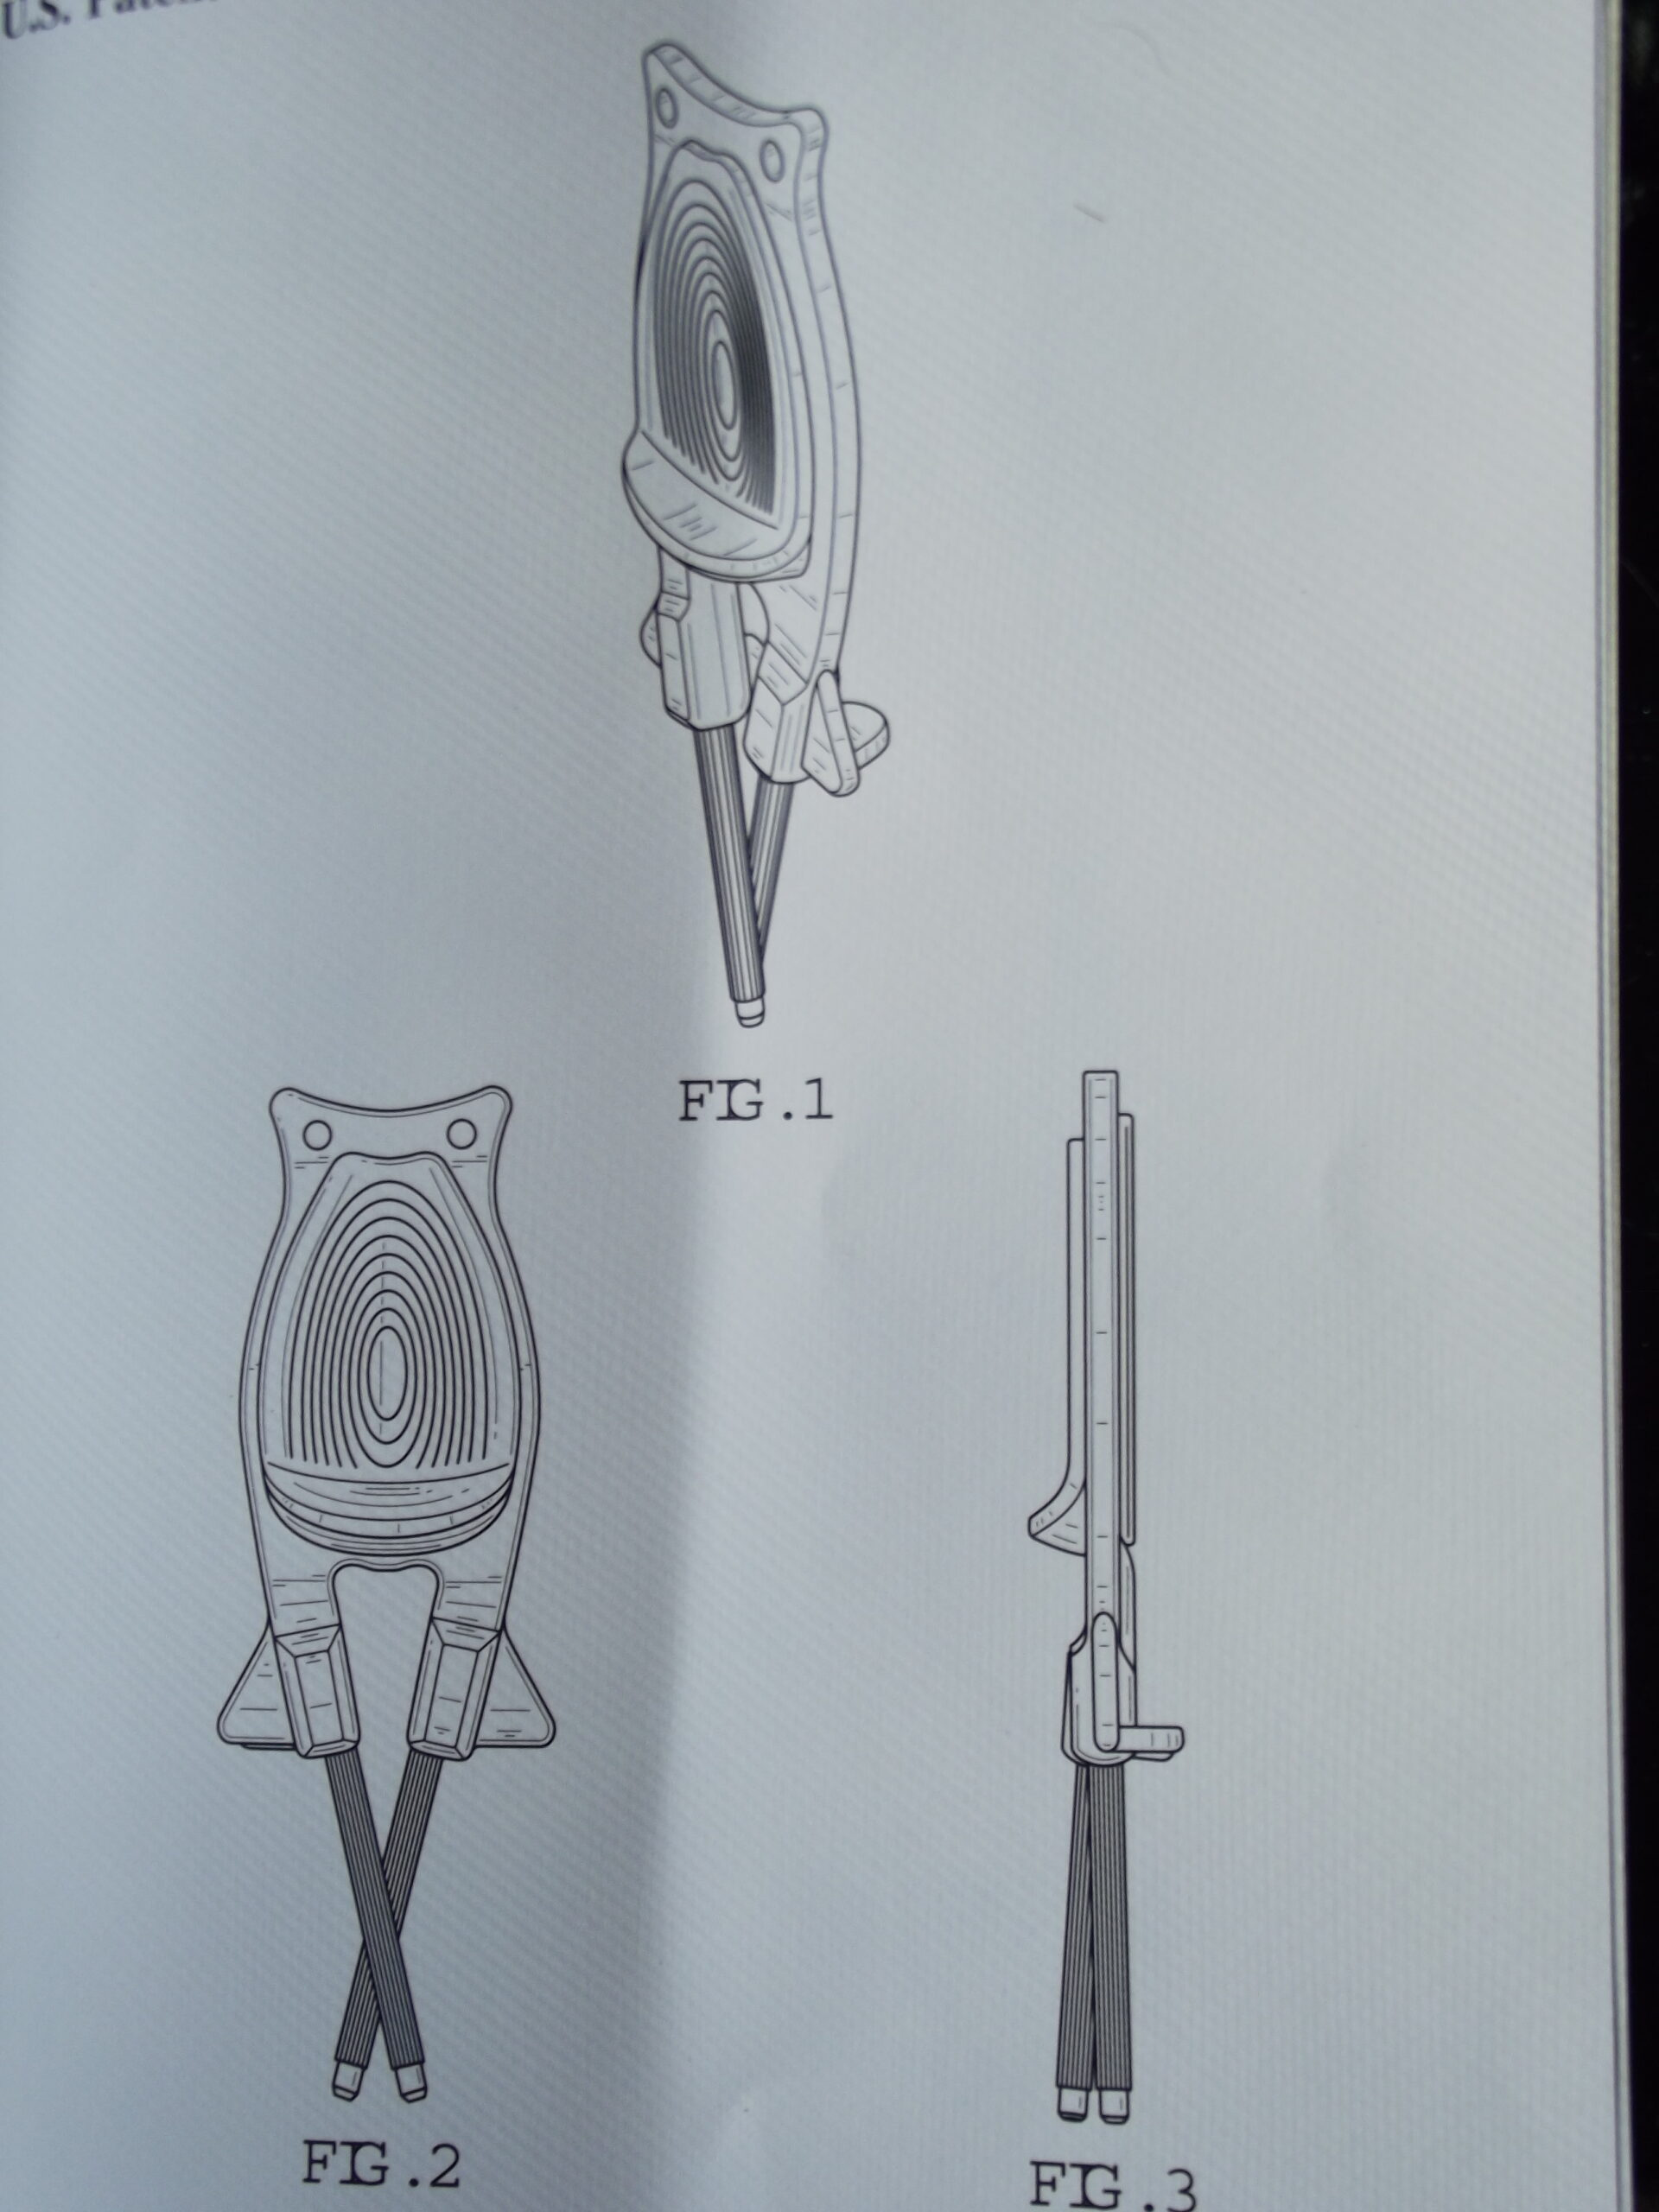 Drawing of Block's Patent Knife sharpener